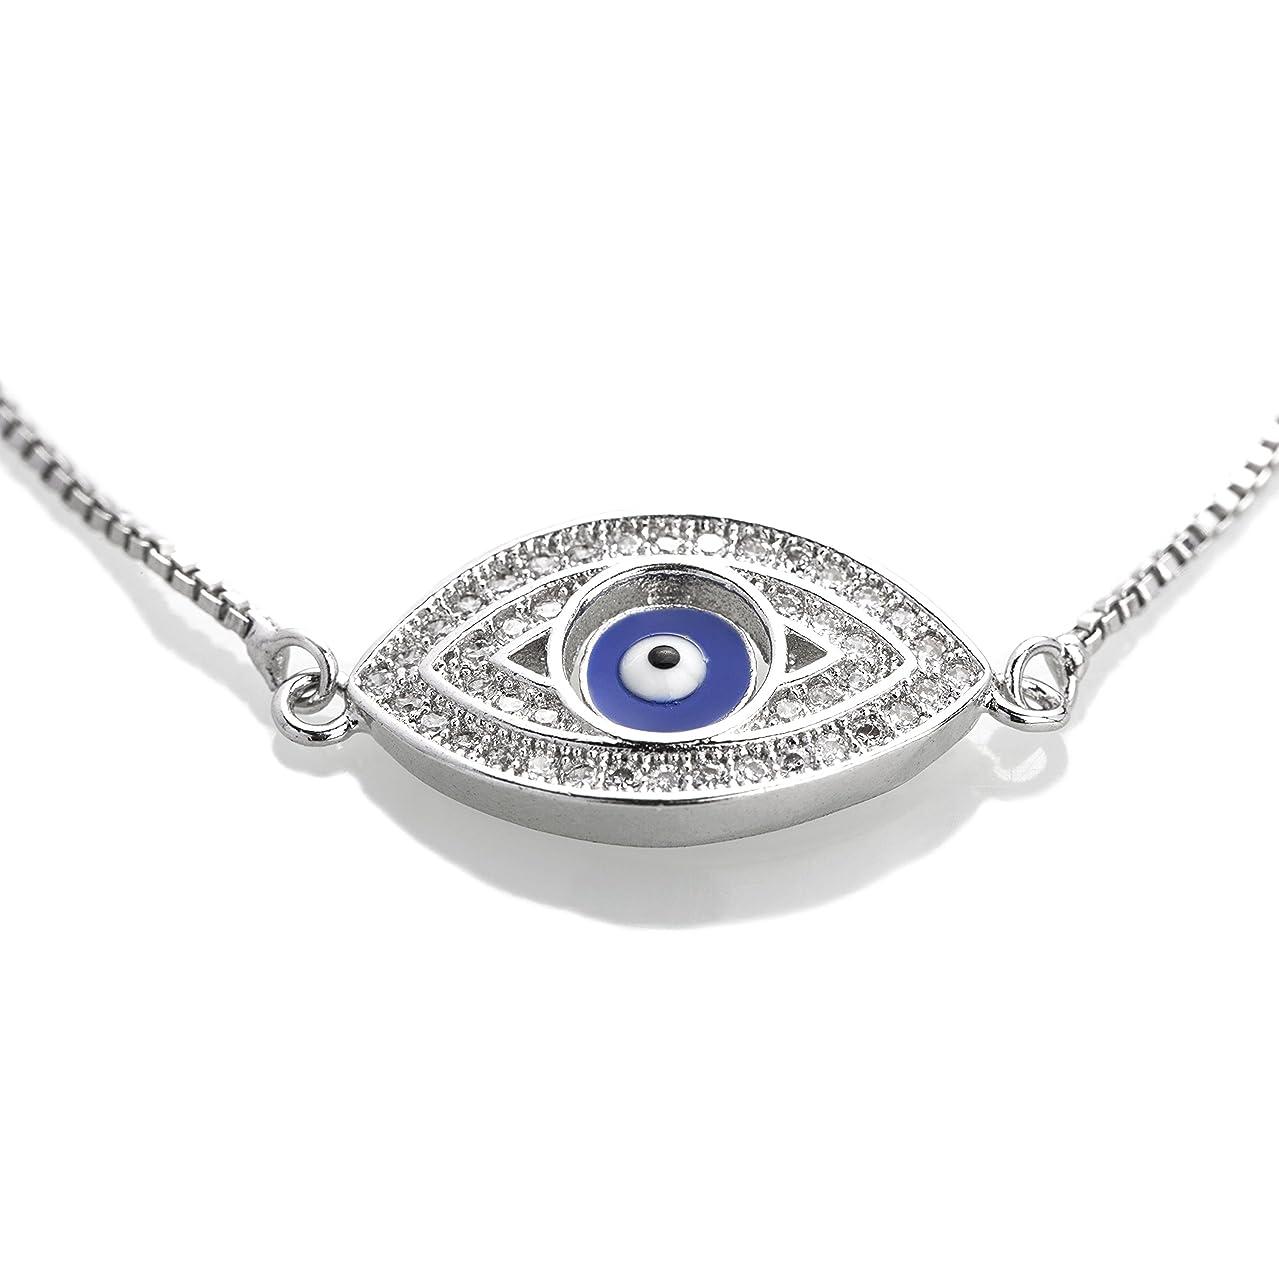 Moon Dust Sterling Silver Plated American Diamond Evil Eye Charm Strand Bracelet For Girls, Teens & Women (MD_3031)